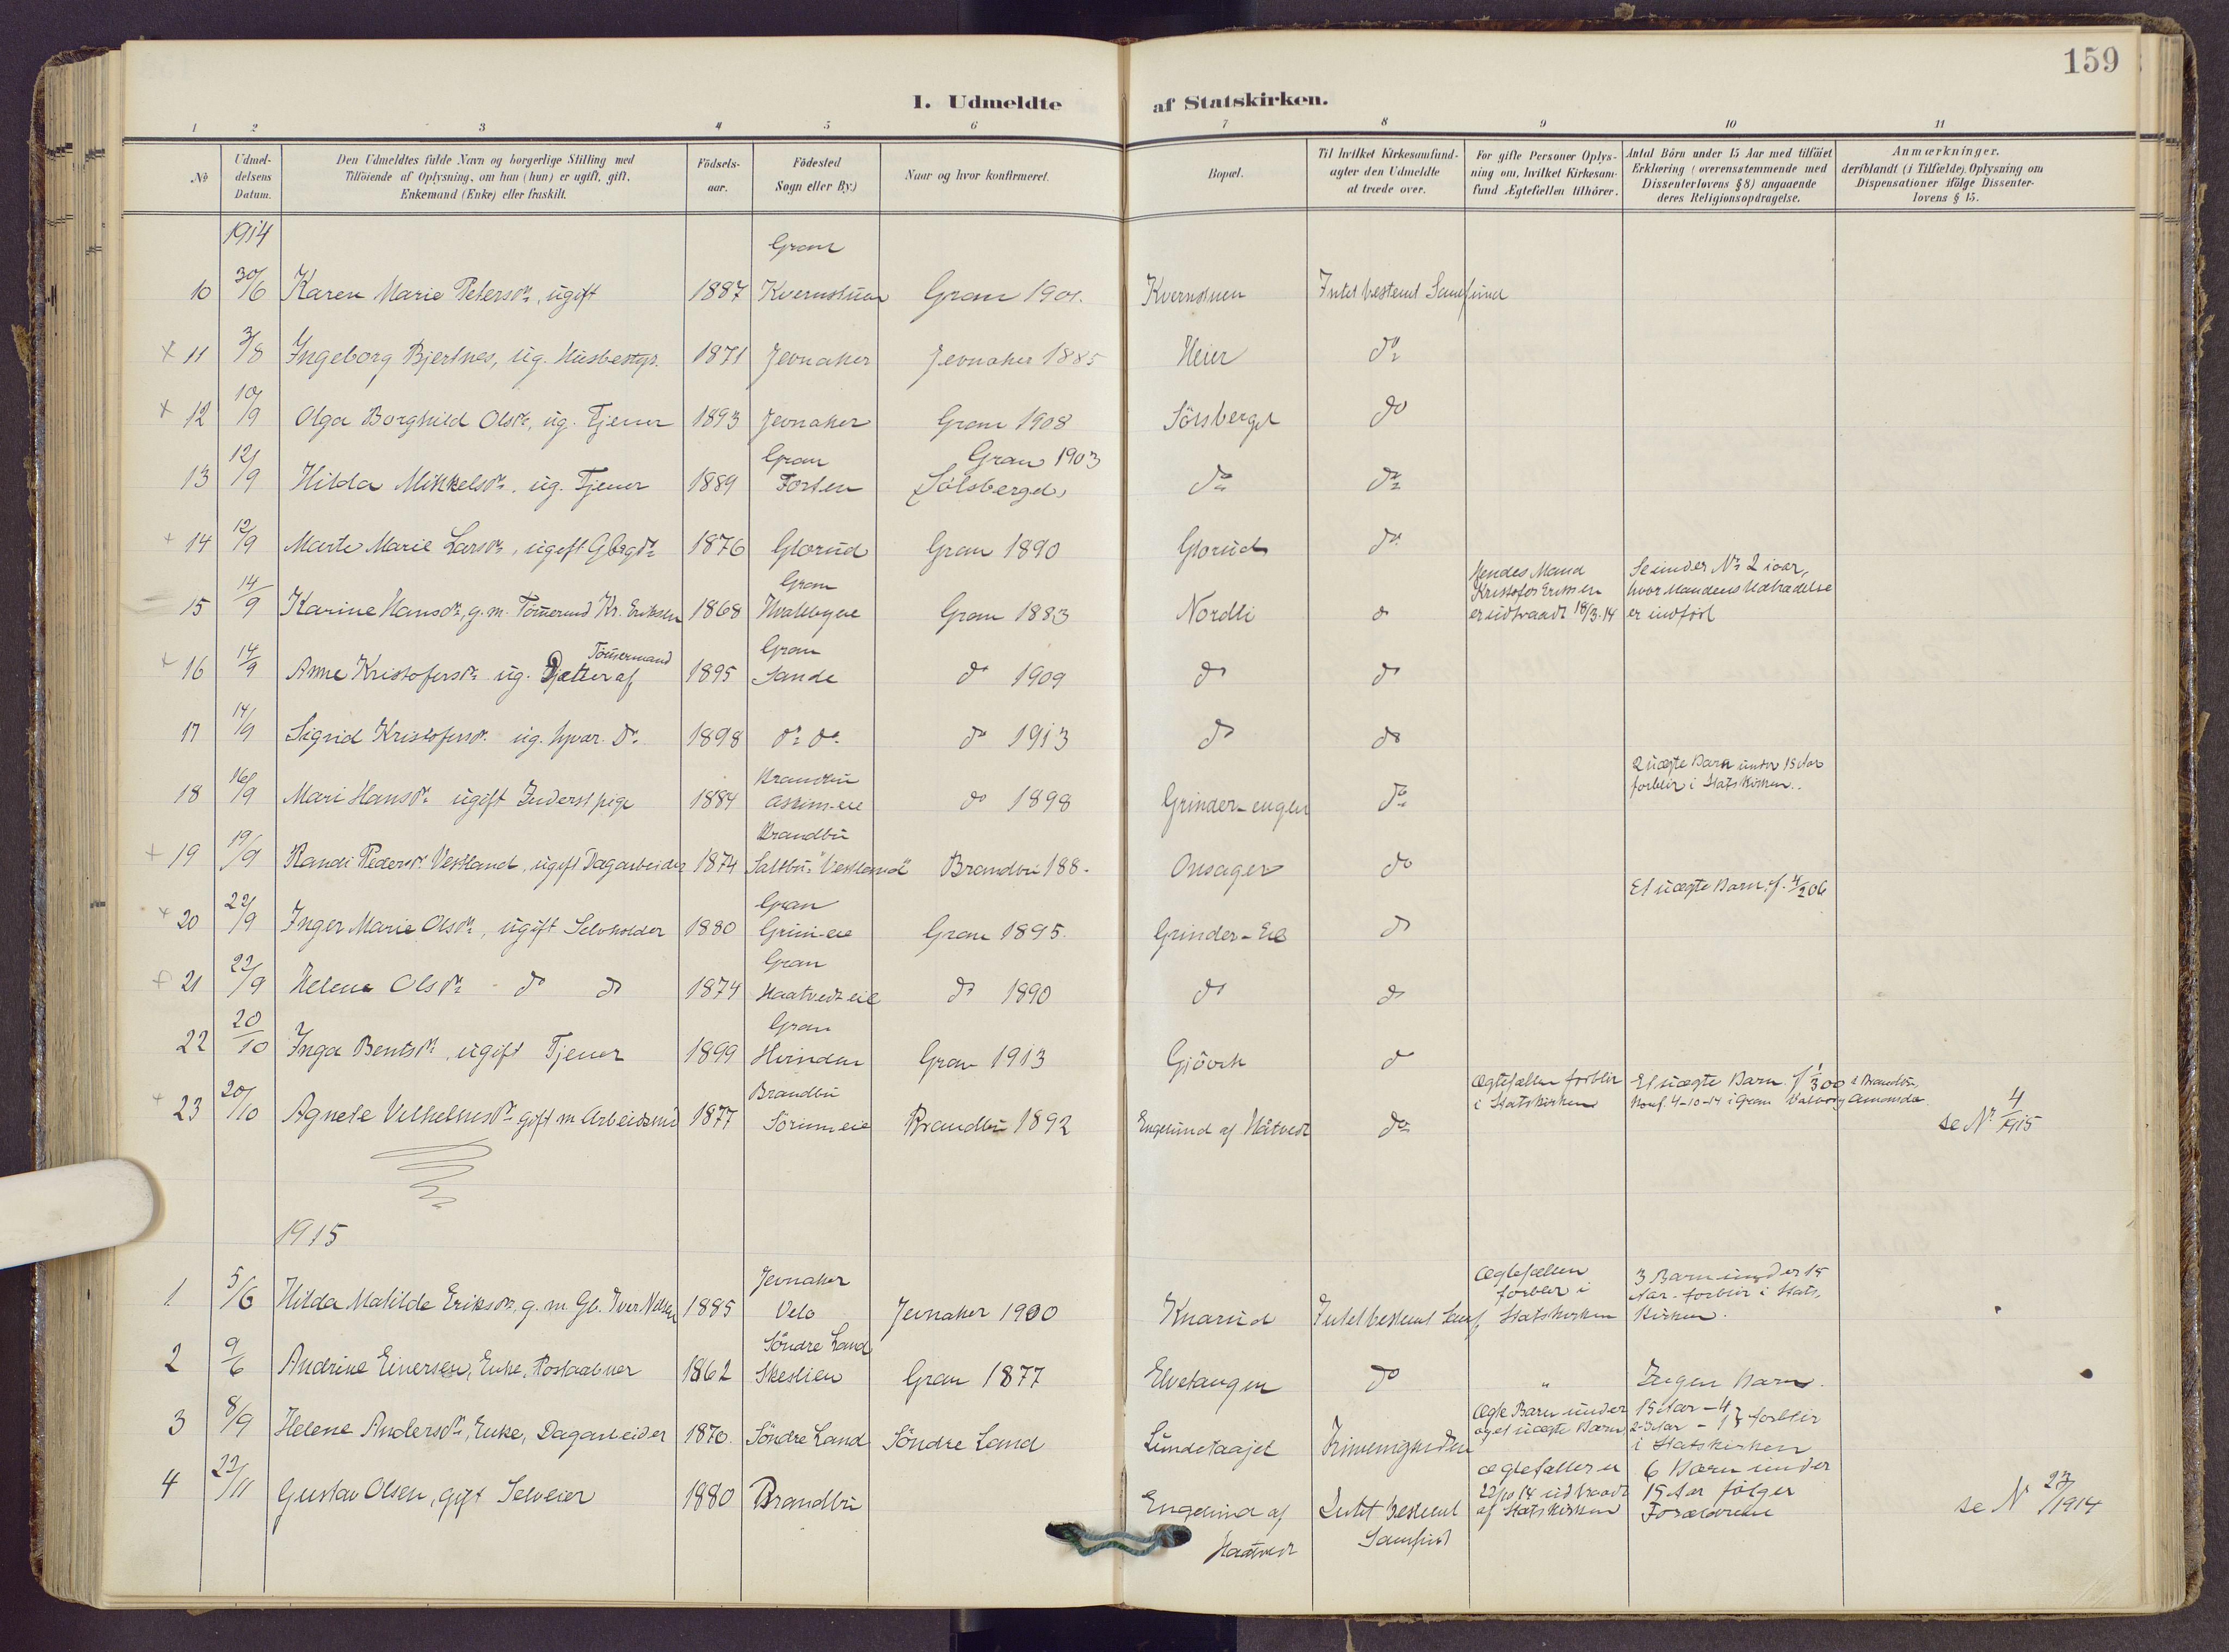 SAH, Gran prestekontor, Ministerialbok nr. 22, 1908-1918, s. 159